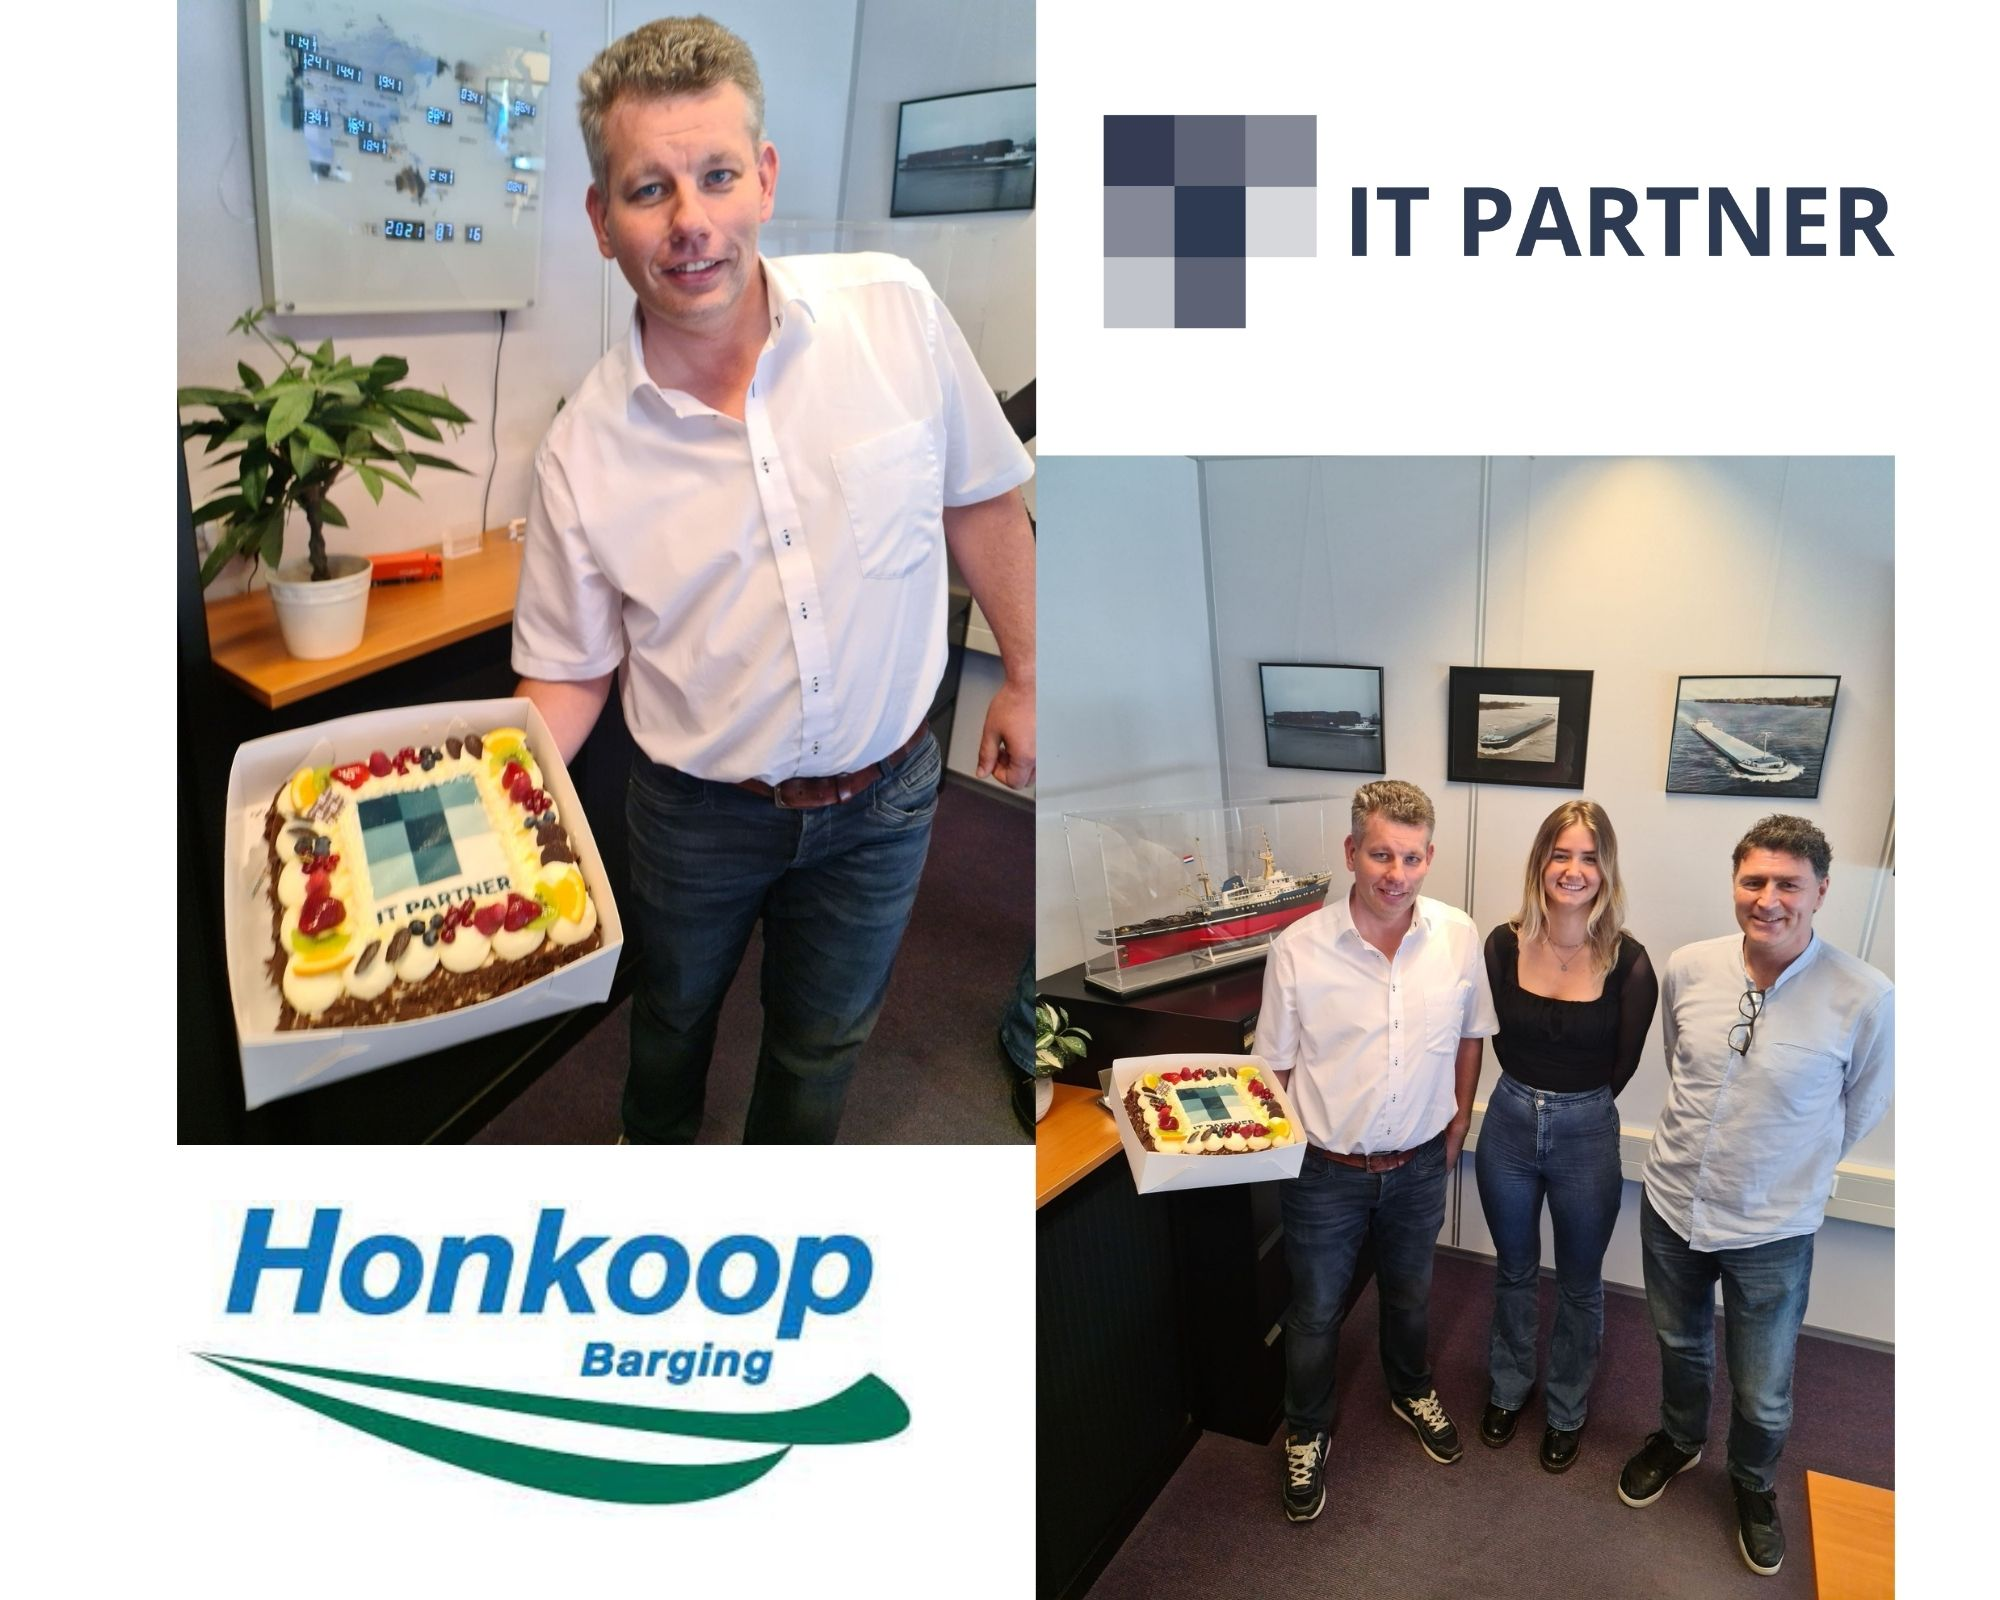 Honkoop Barging and staff of IT Partner